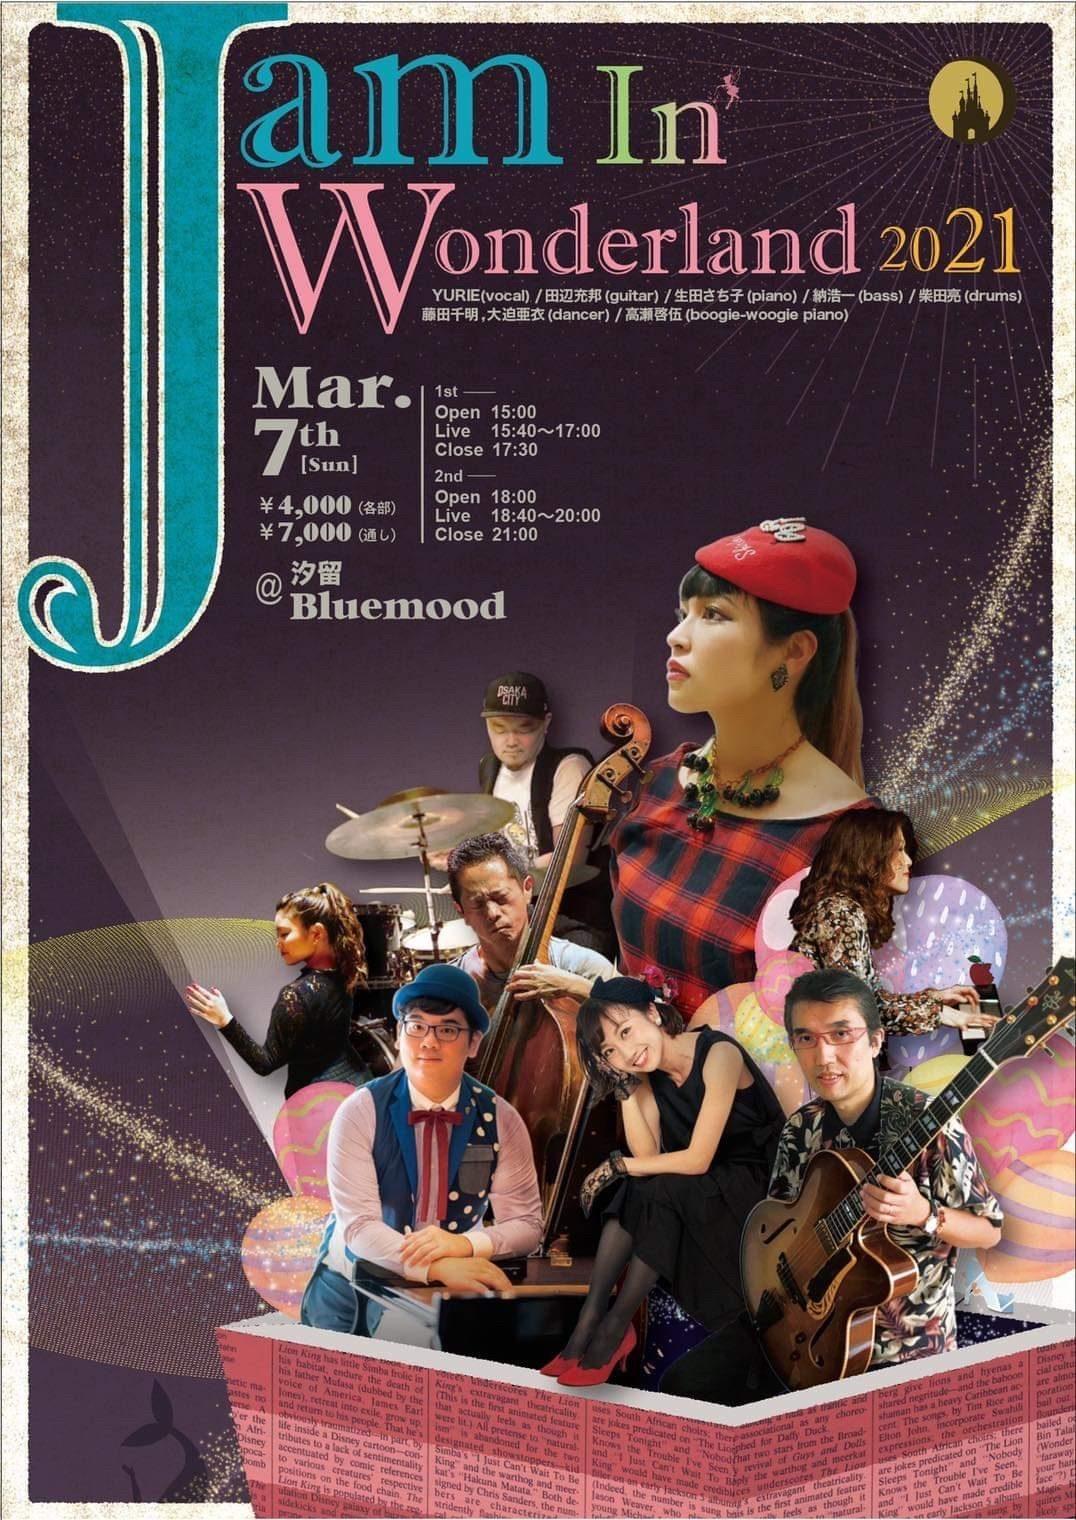 Jam in wonderland 2021